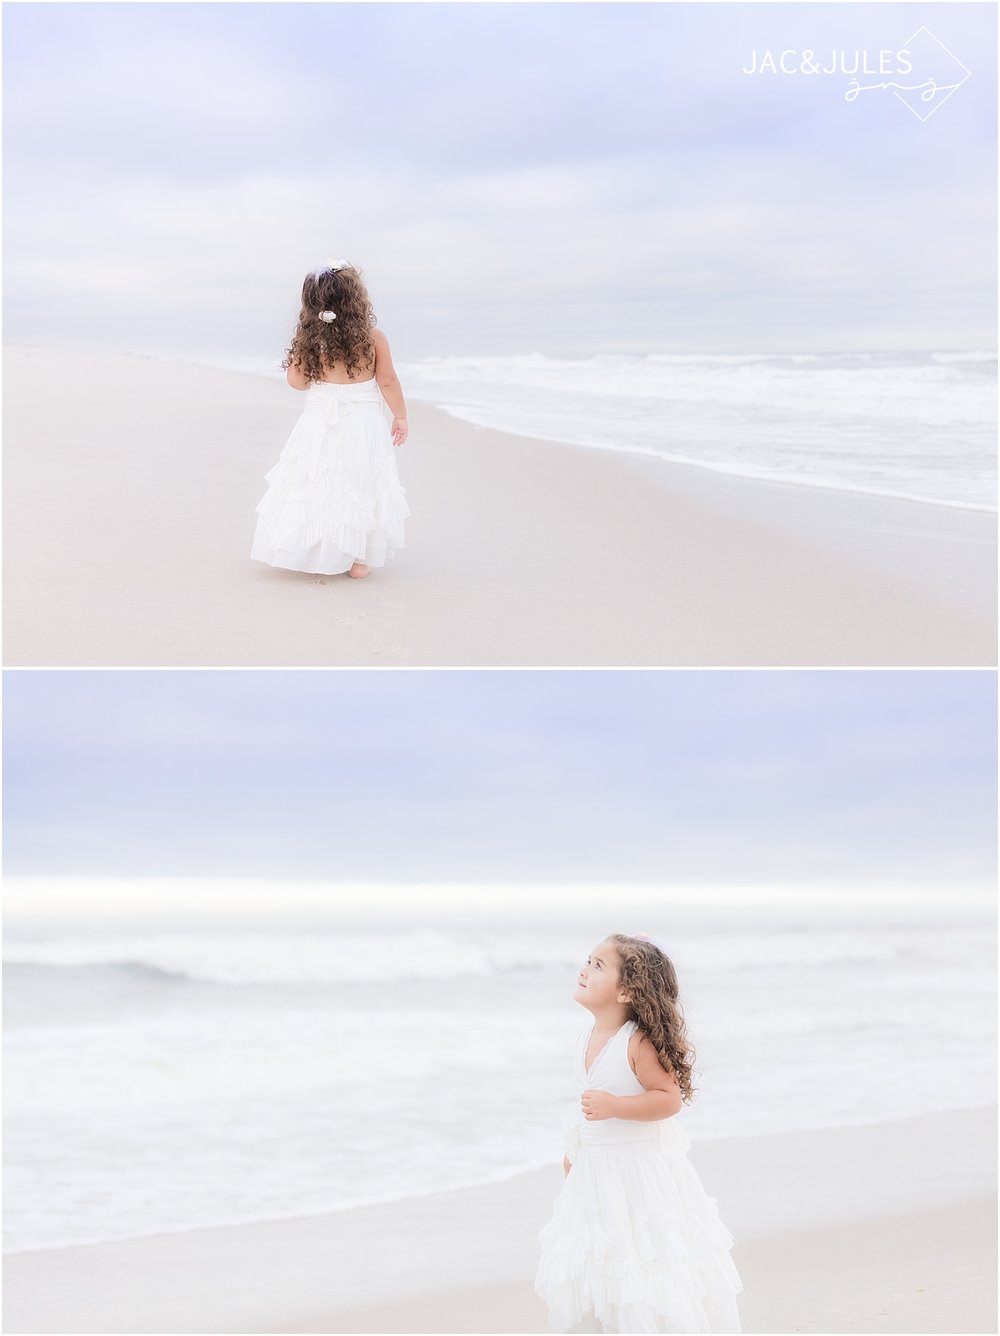 seaside park child beach picture